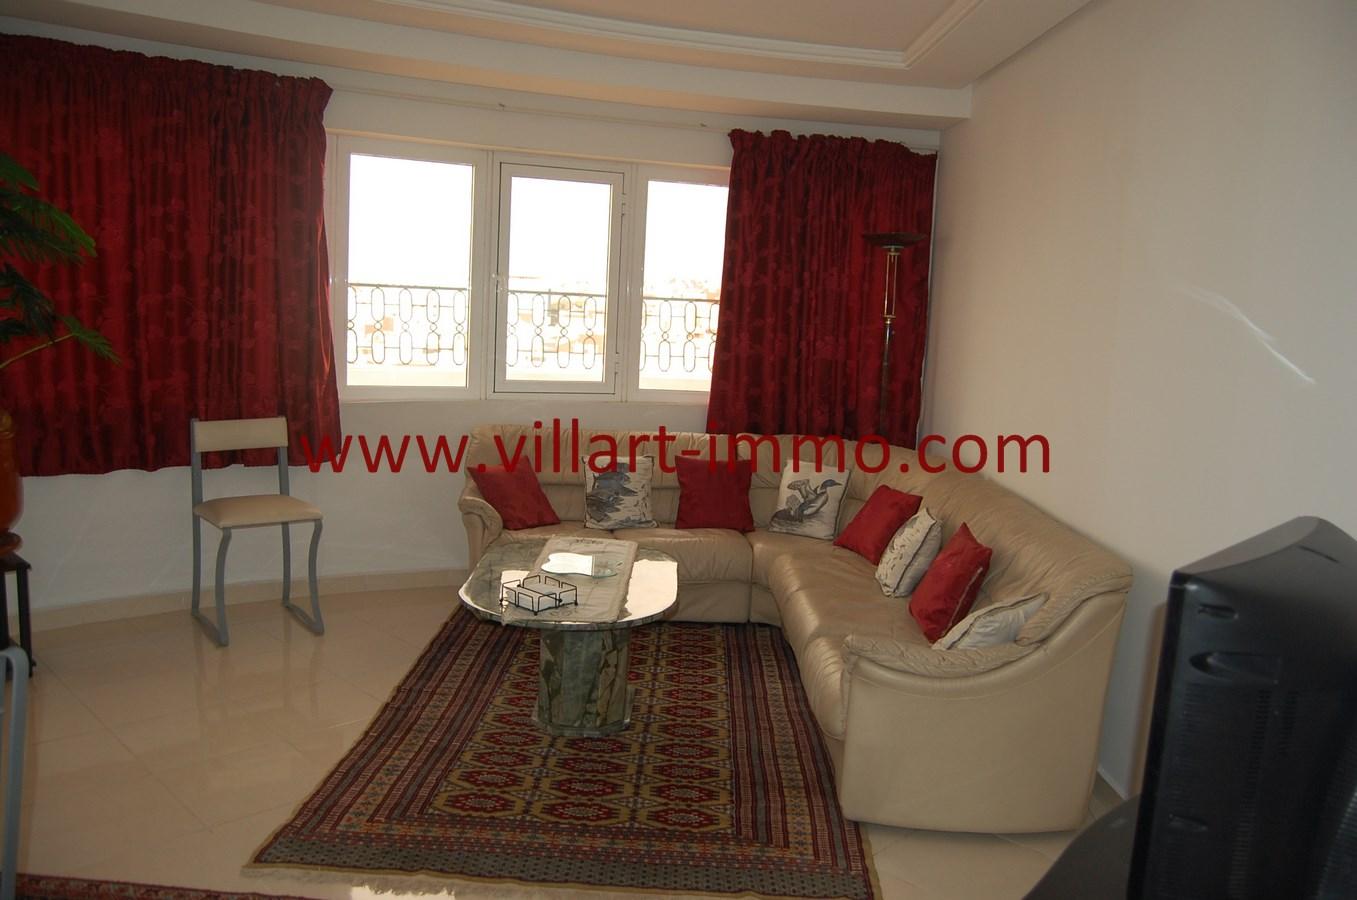 2-Vente-Appartement-Tanger-Route de Rabat-Salon 1-VA494-Villart Immo